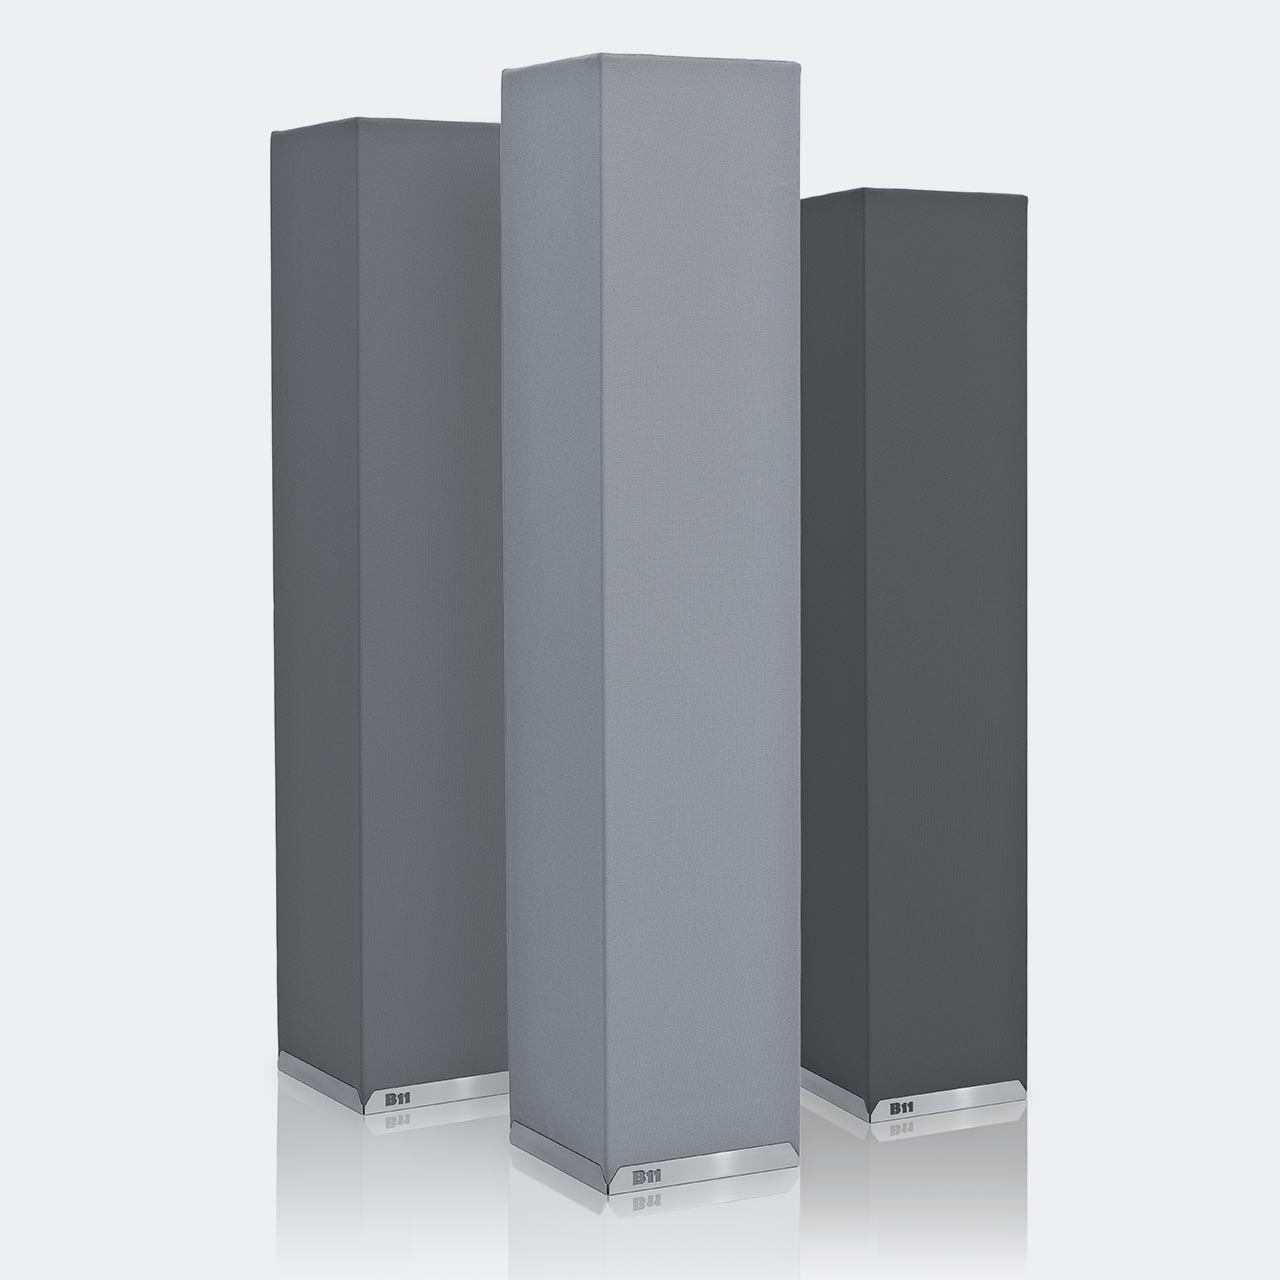 Akustiksäule, Standabsorber, Akustikschaumstoff, Akustikelemente, Breitbandabsorber, Basotect, Schallabsorber, Schaumstoff Schallschutz, Raumakustik Absorber